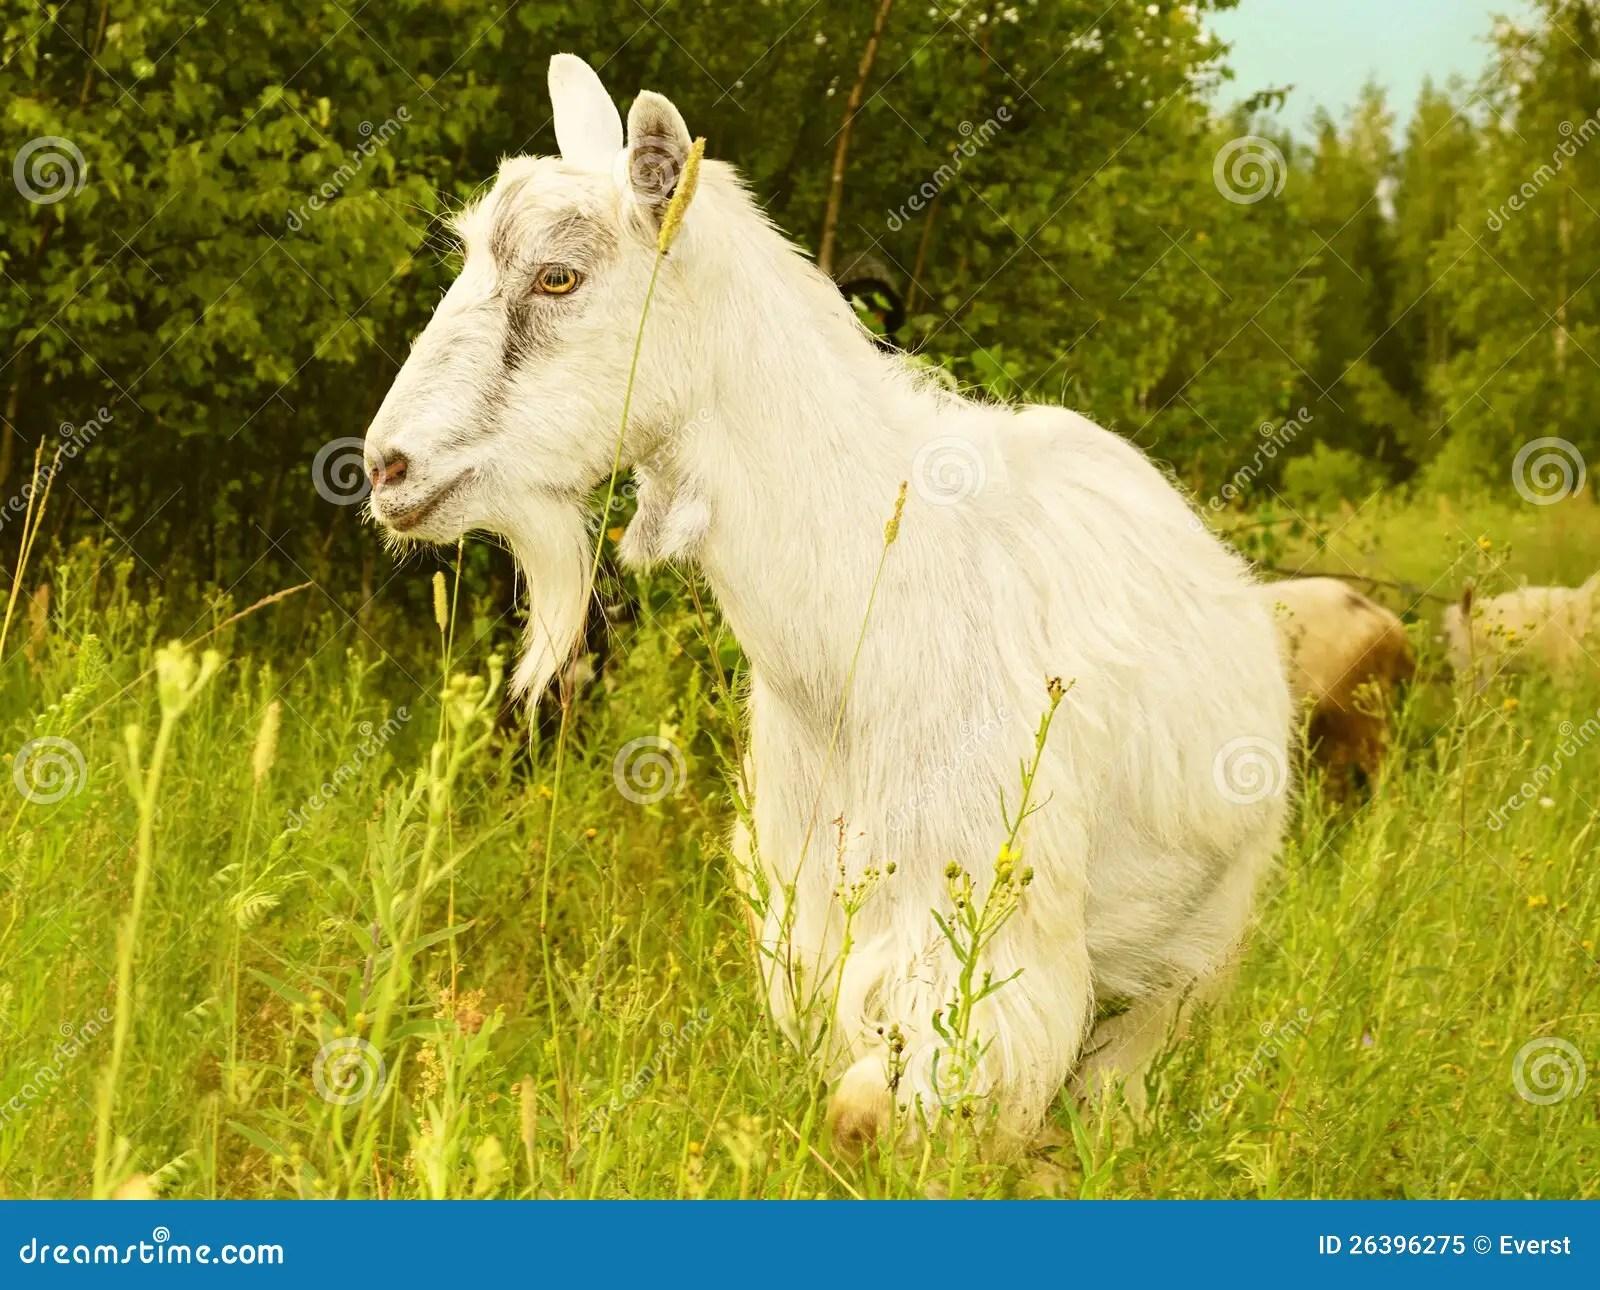 Goat White Farm Animal Stock Image Image Of Ears